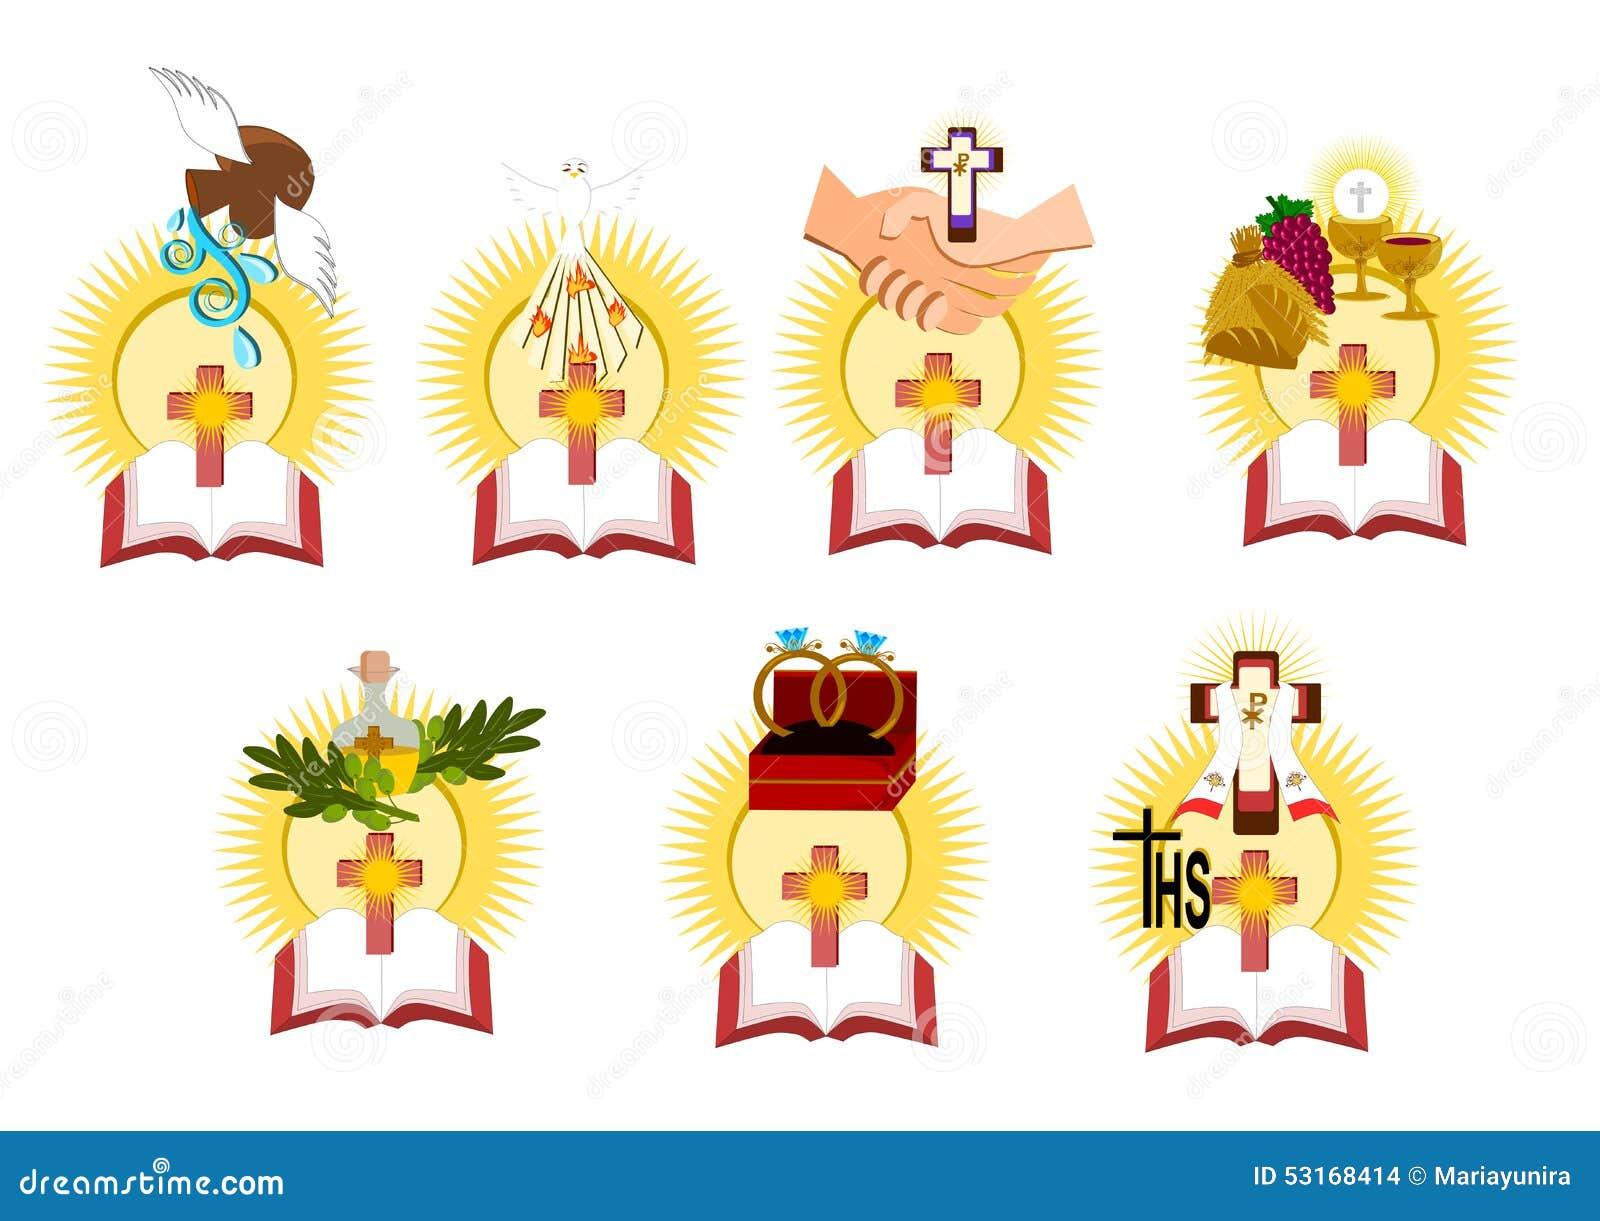 the seven catholic sacraments essay The seven sacred sacraments in the catholic lifestyle - the seven sacred sacraments in the catholic lifestyle are baptism, eucharist, confirmation, reconciliation.